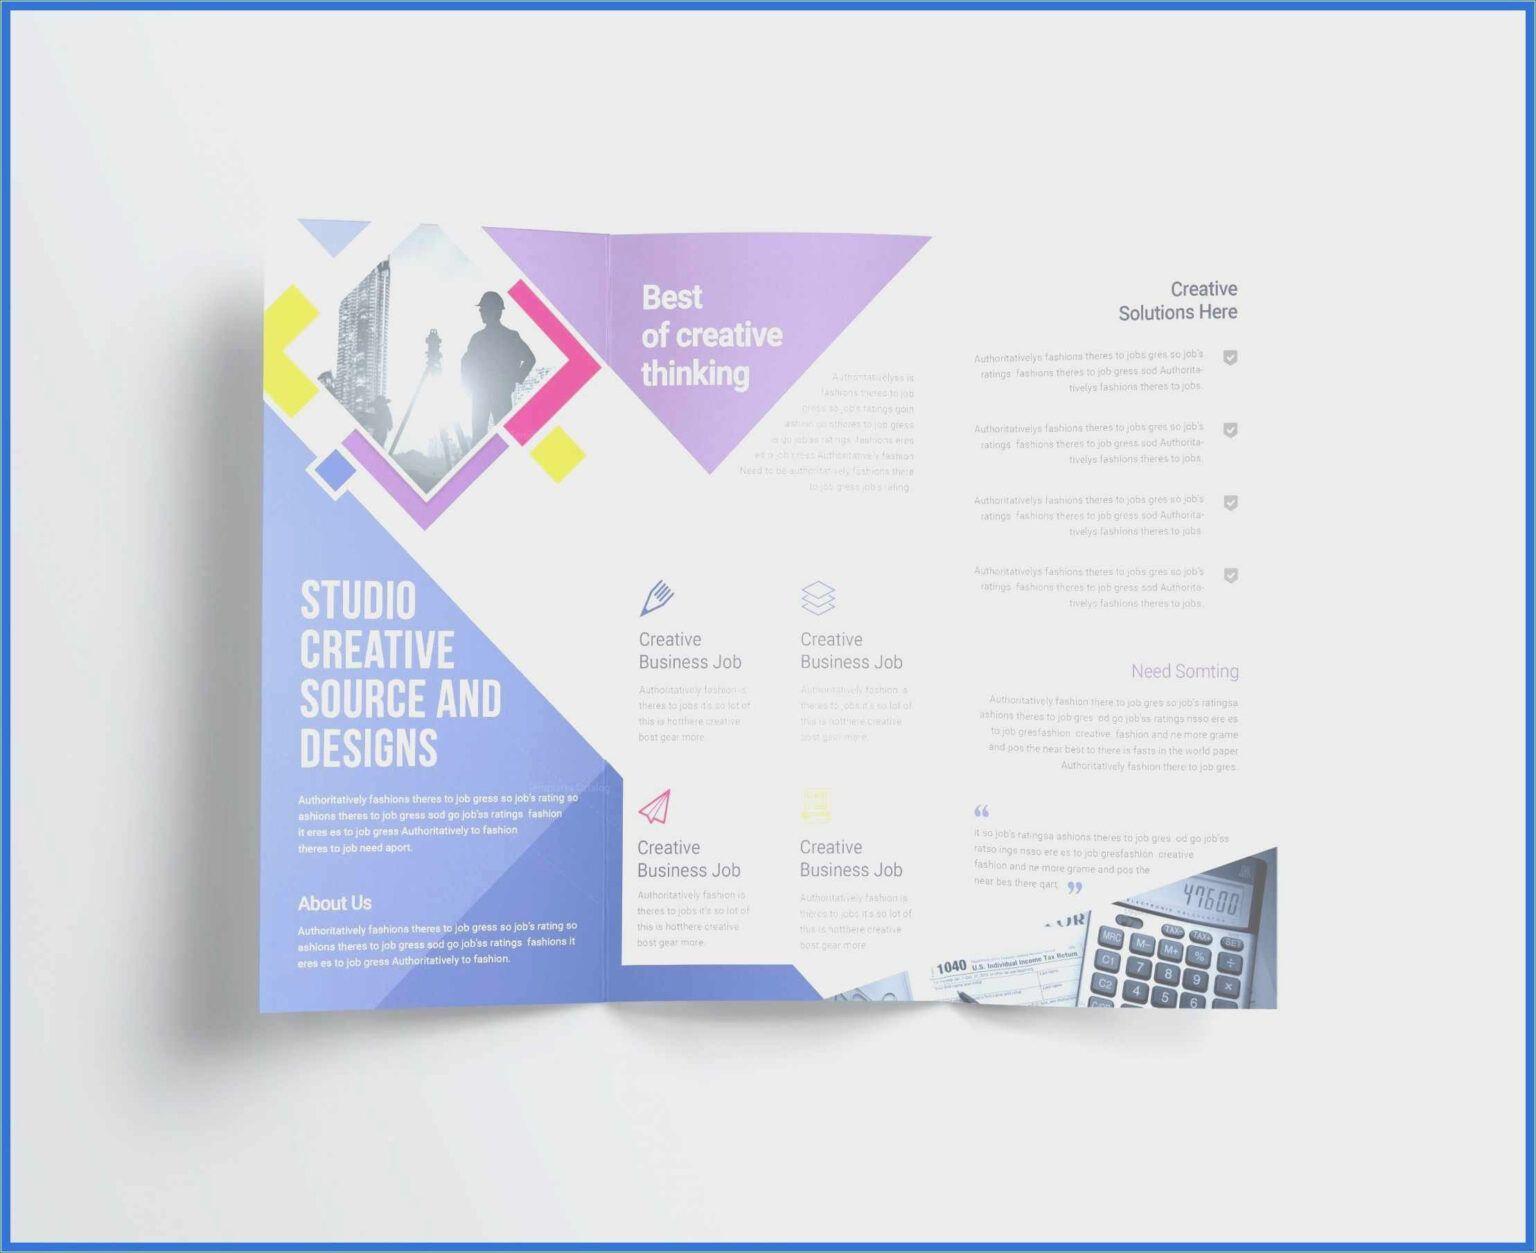 Esthetician Business Card Templates Apocalomegaproductions Regar Business Card Template Psd Photography Business Cards Template Business Card Template Design